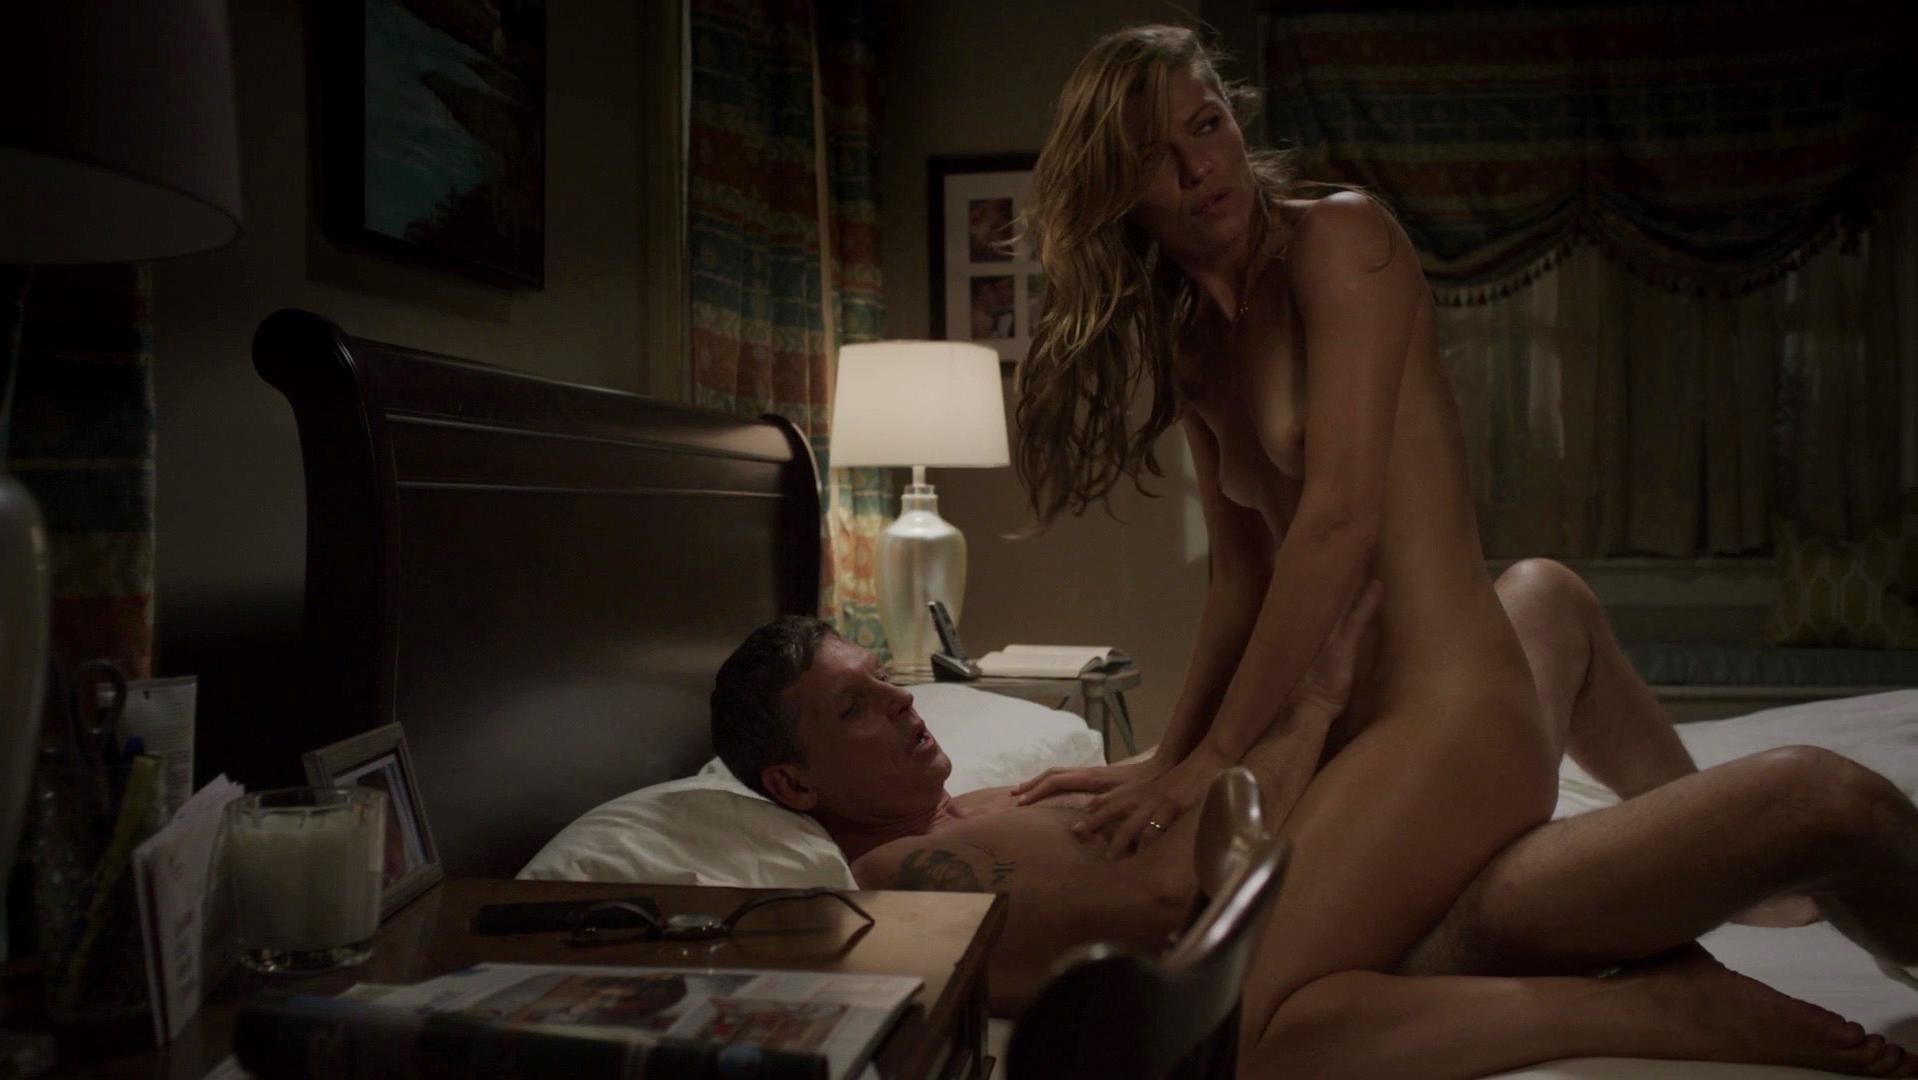 Ivana Milicevic nude, Trieste Kelly Dunn sexy - Banshee s02e09 (2014)